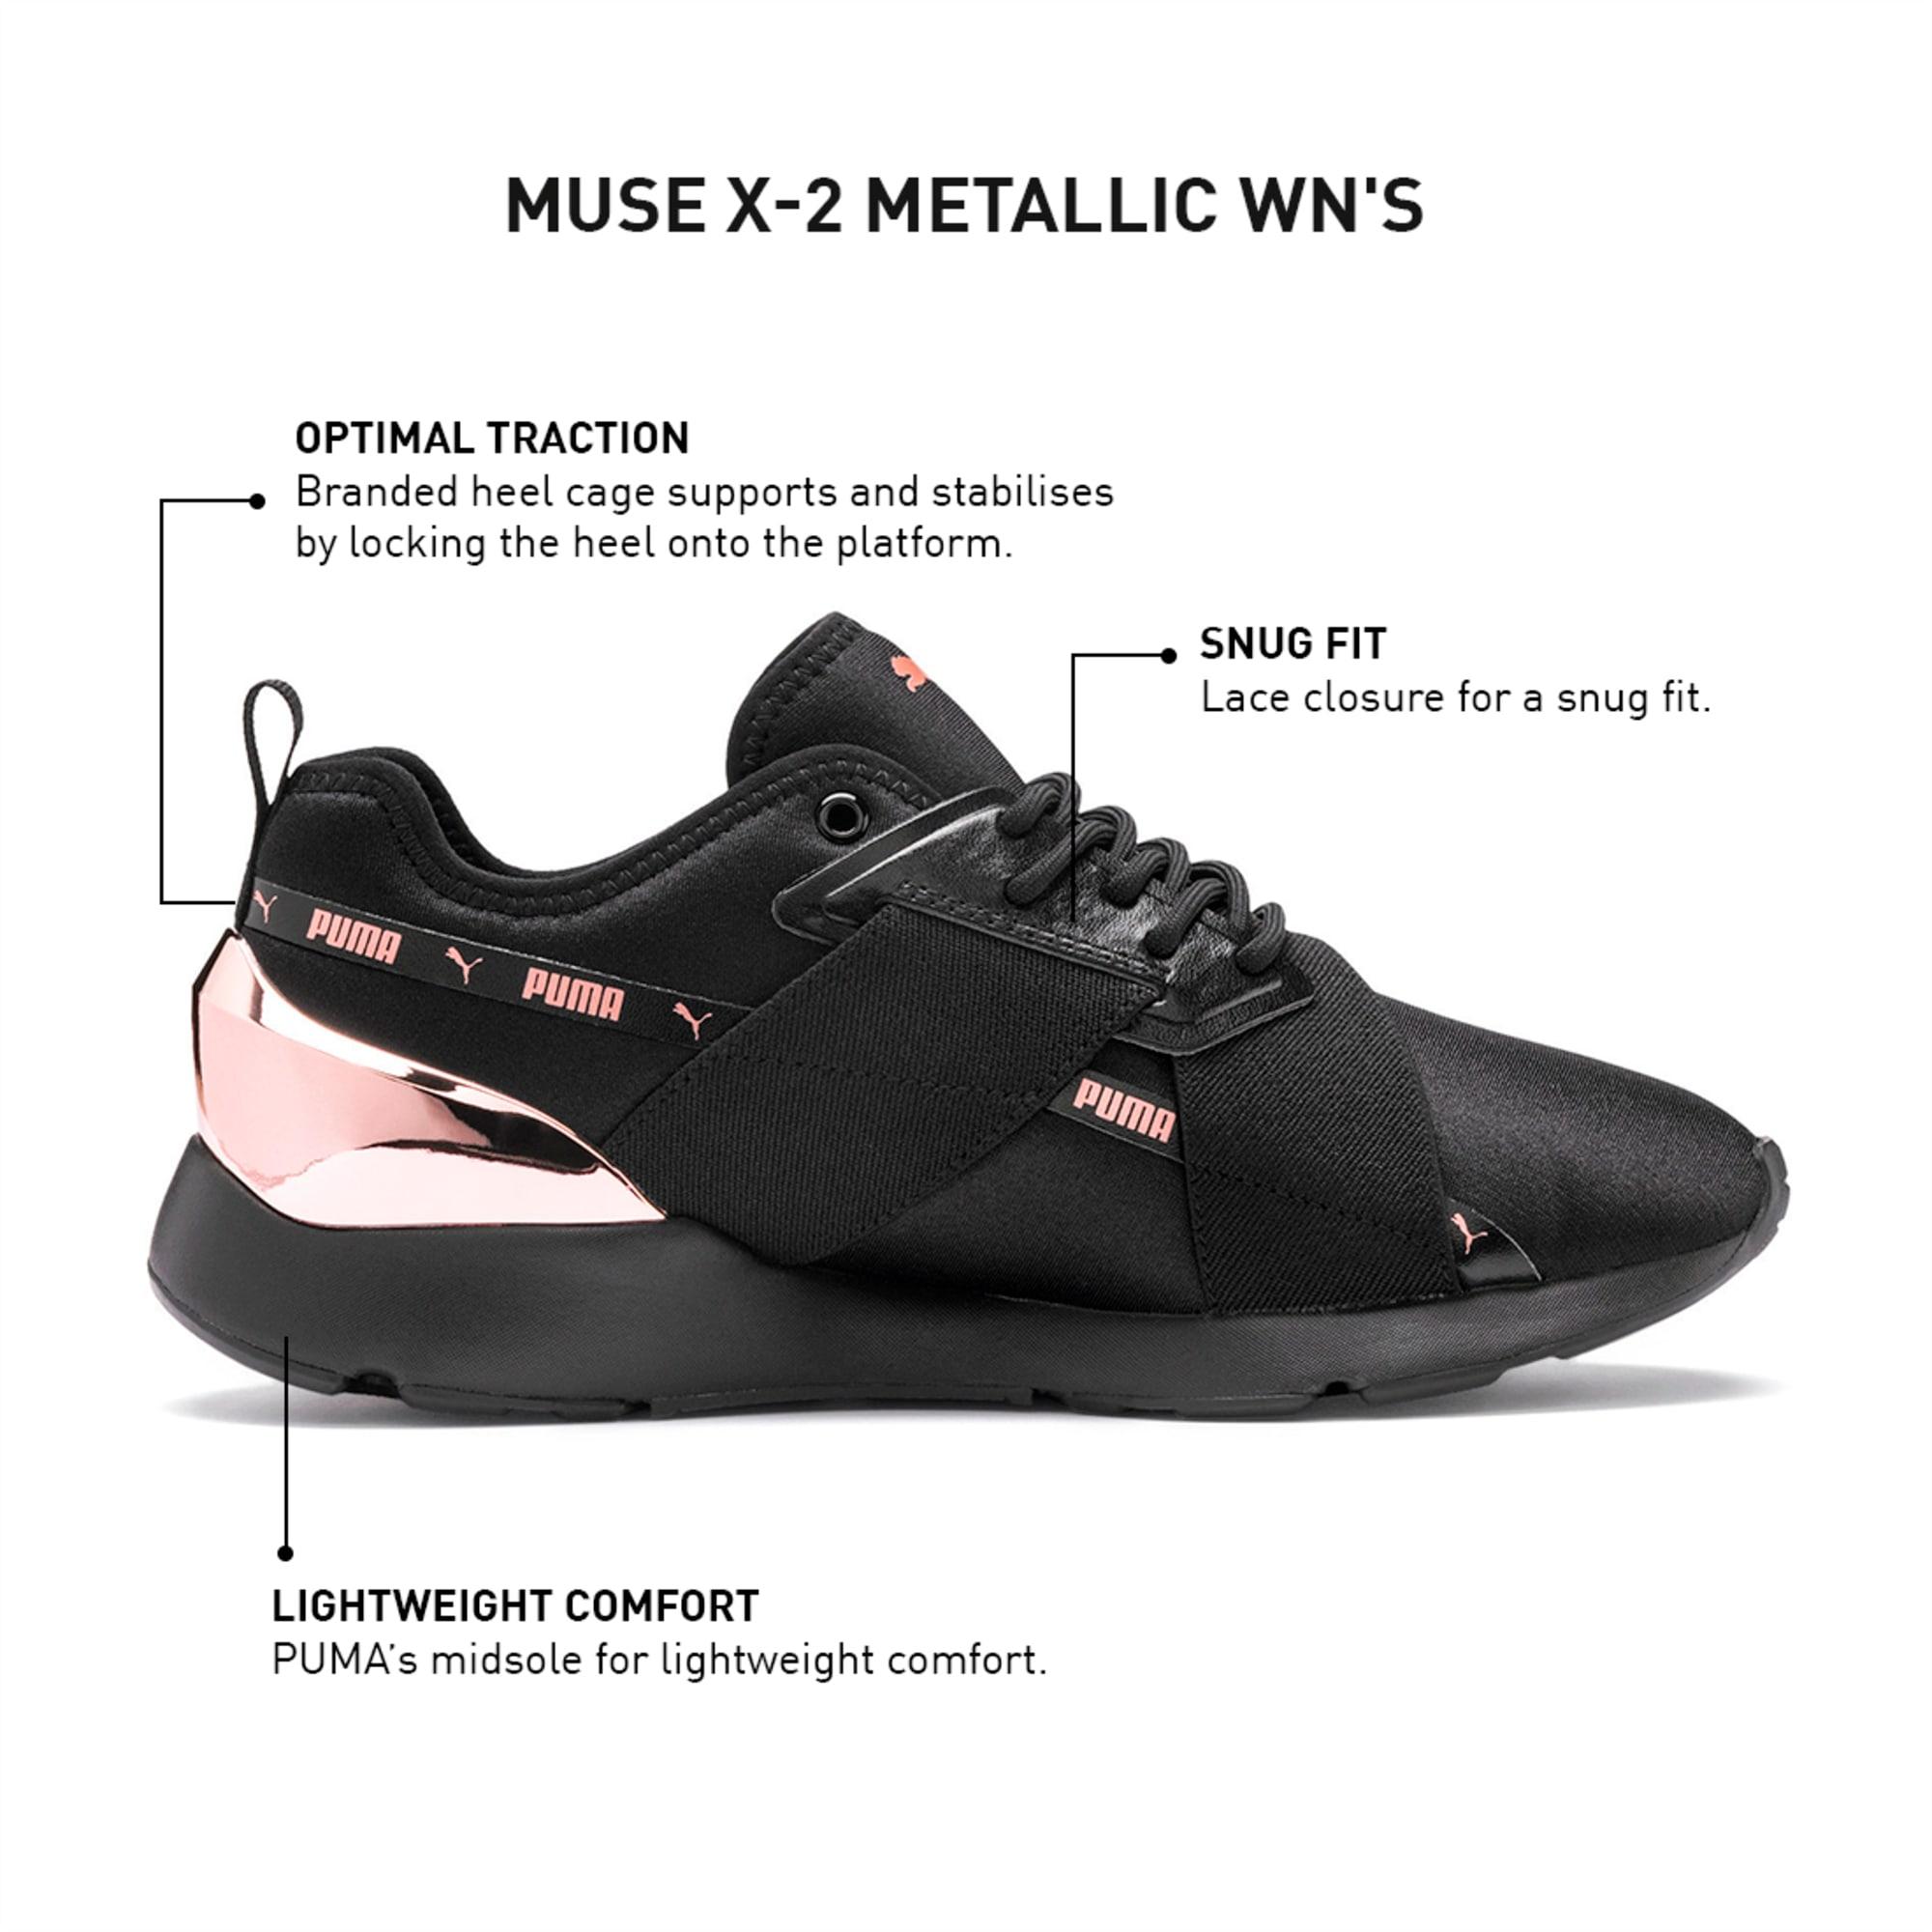 Muse X 2 Metallic Imeva Women S Shoes Puma Black Rose Gold Puma Sneakers Puma